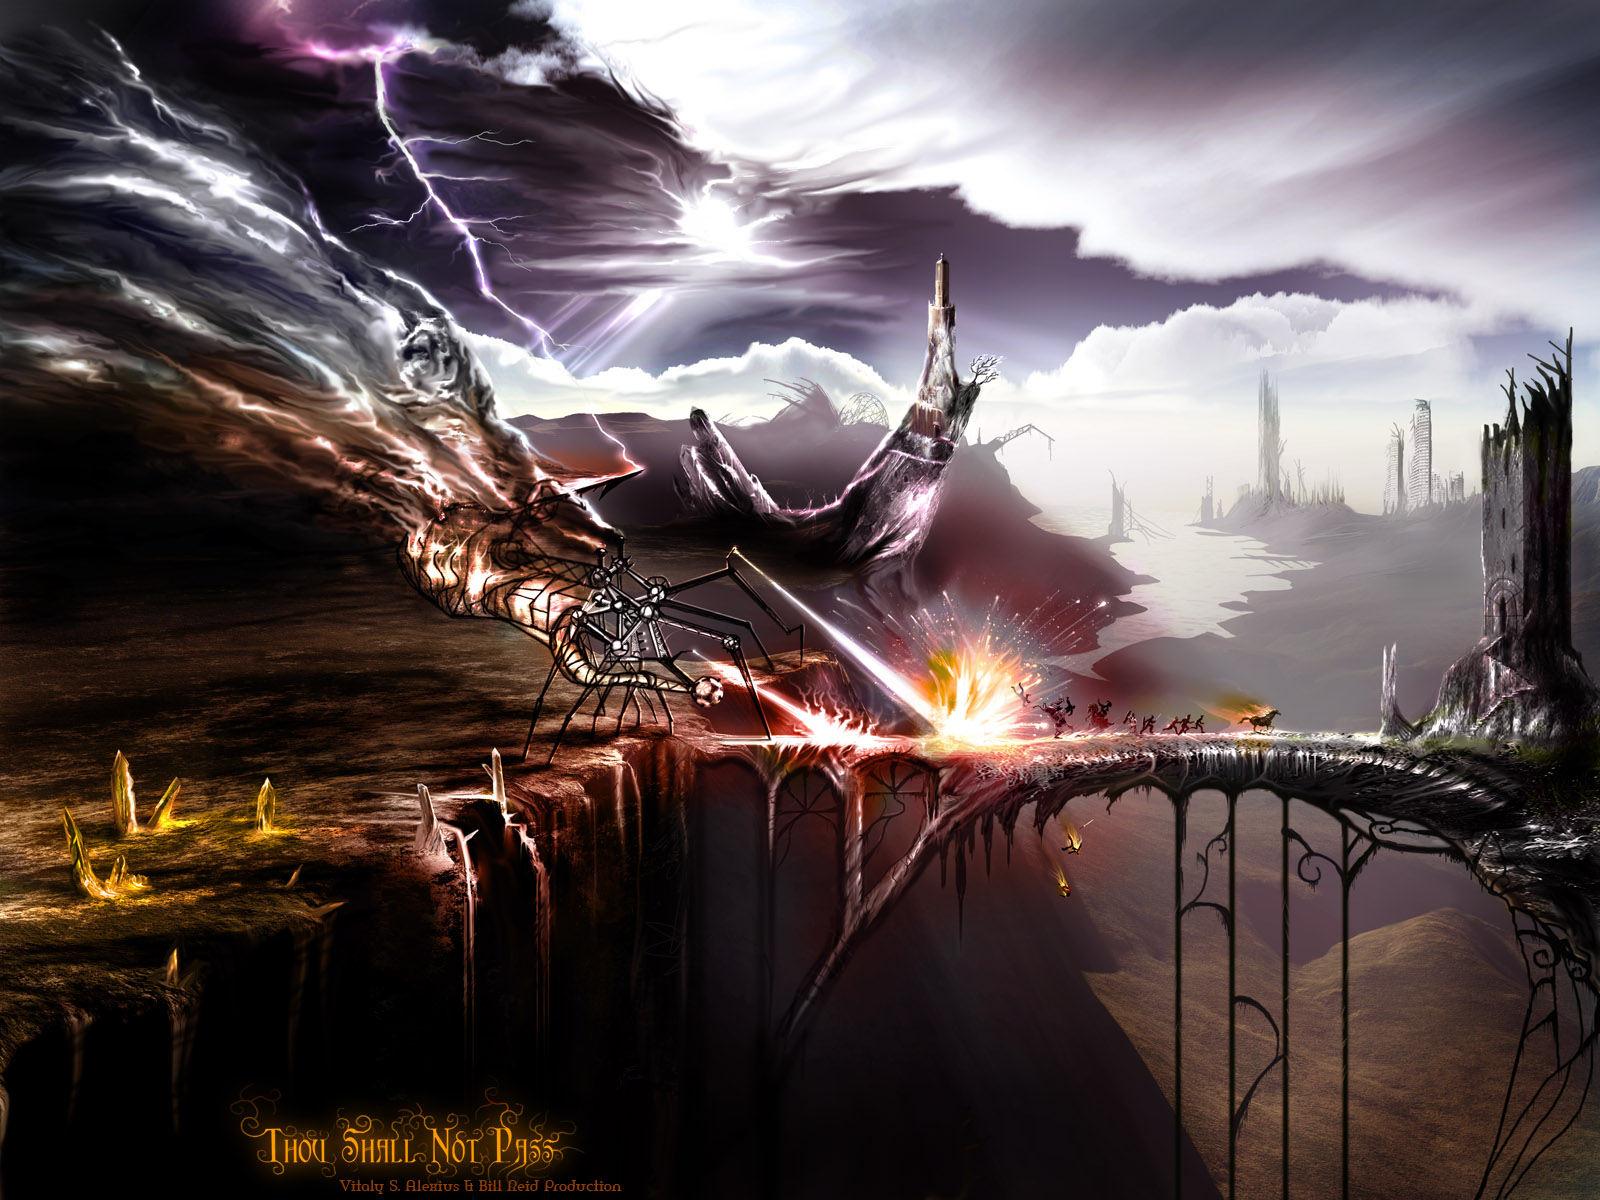 Wallpapers hd desktop wallpapers free online fantasy - Fantasy desktop pictures ...